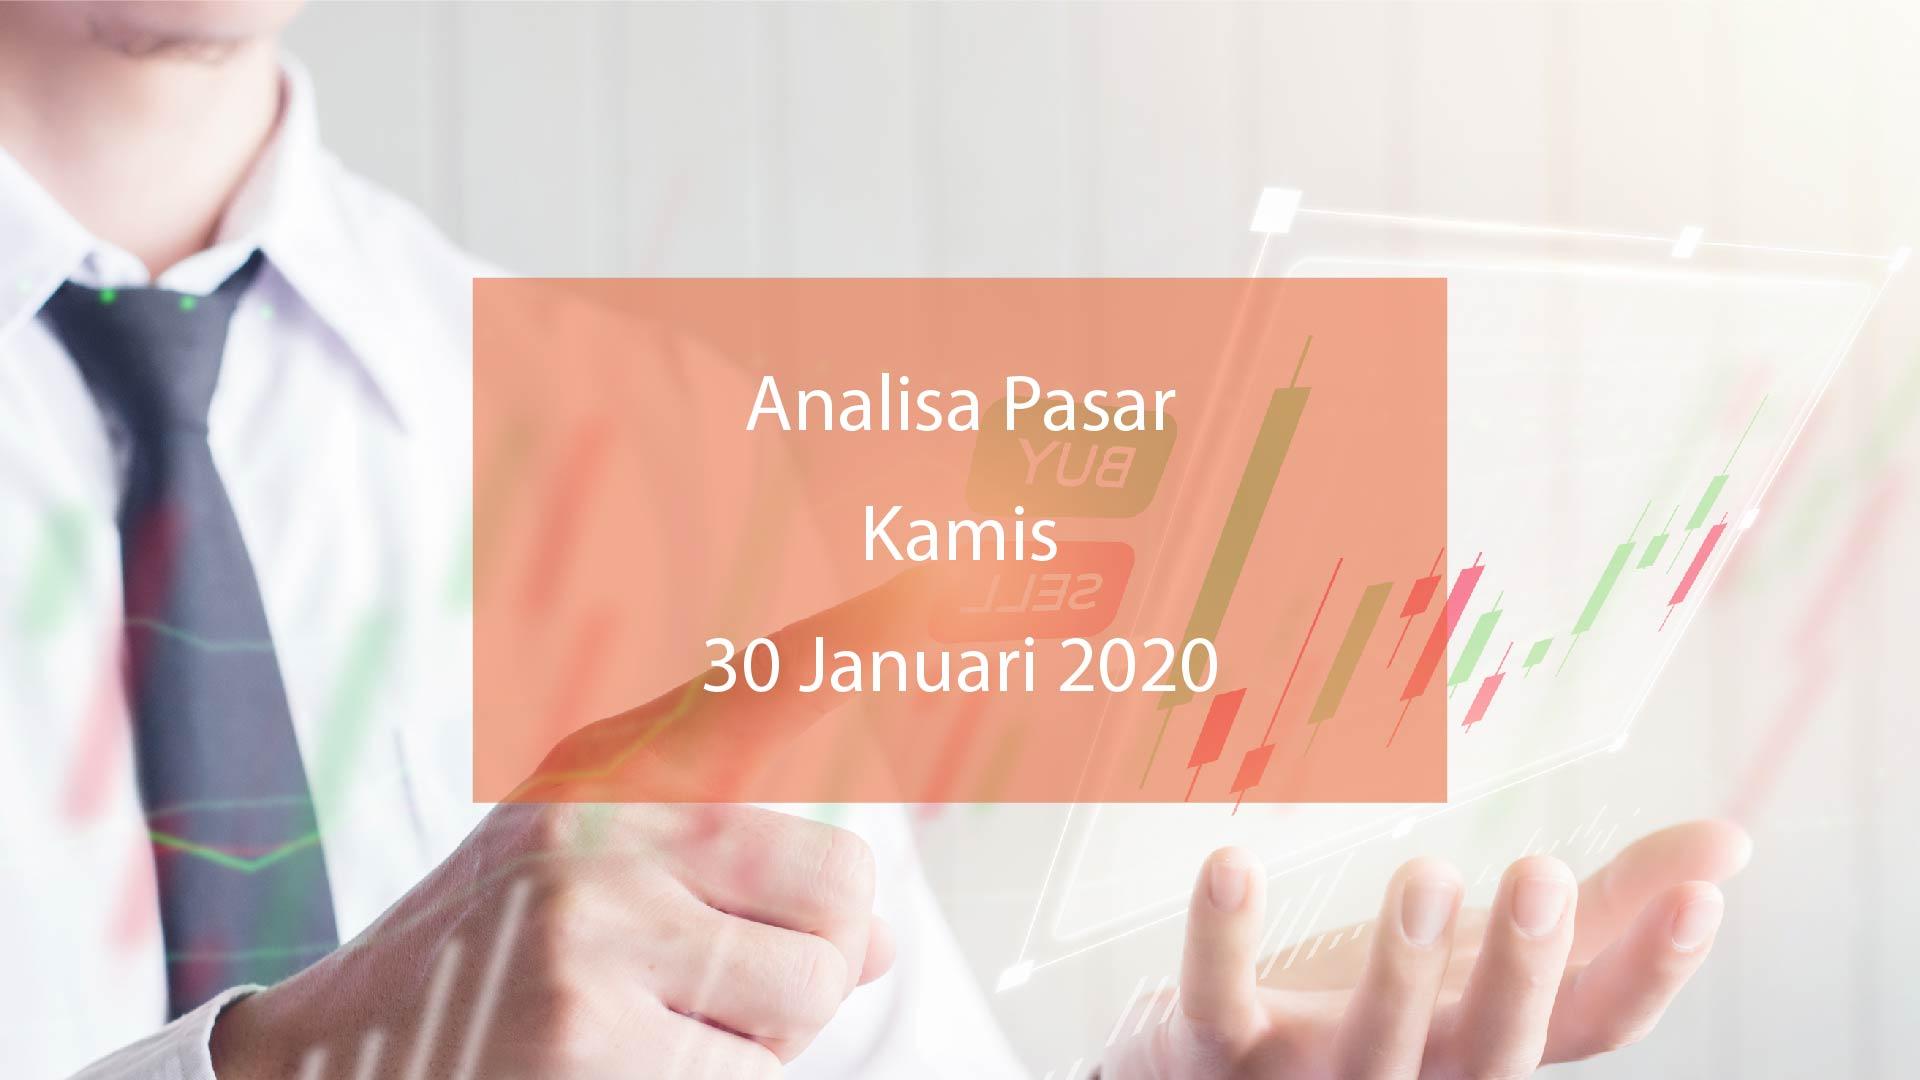 analisa pasar hsb 30 januari 2020